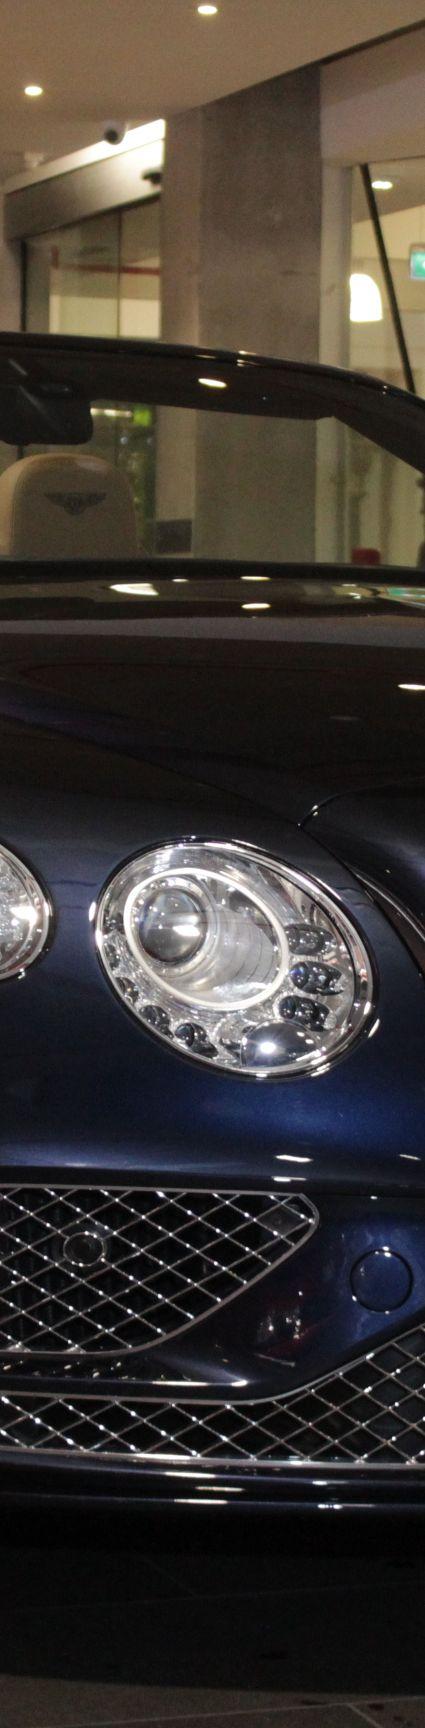 2015 Bentley Continental 3W GT Speed Convertible 2dr Spts Auto 8sp 4x4 6.0TT [MY16] in blue at Dutton Garage for sale 41 Madden grove Richmond Melbourne Victoria Australia Make Mine Rare